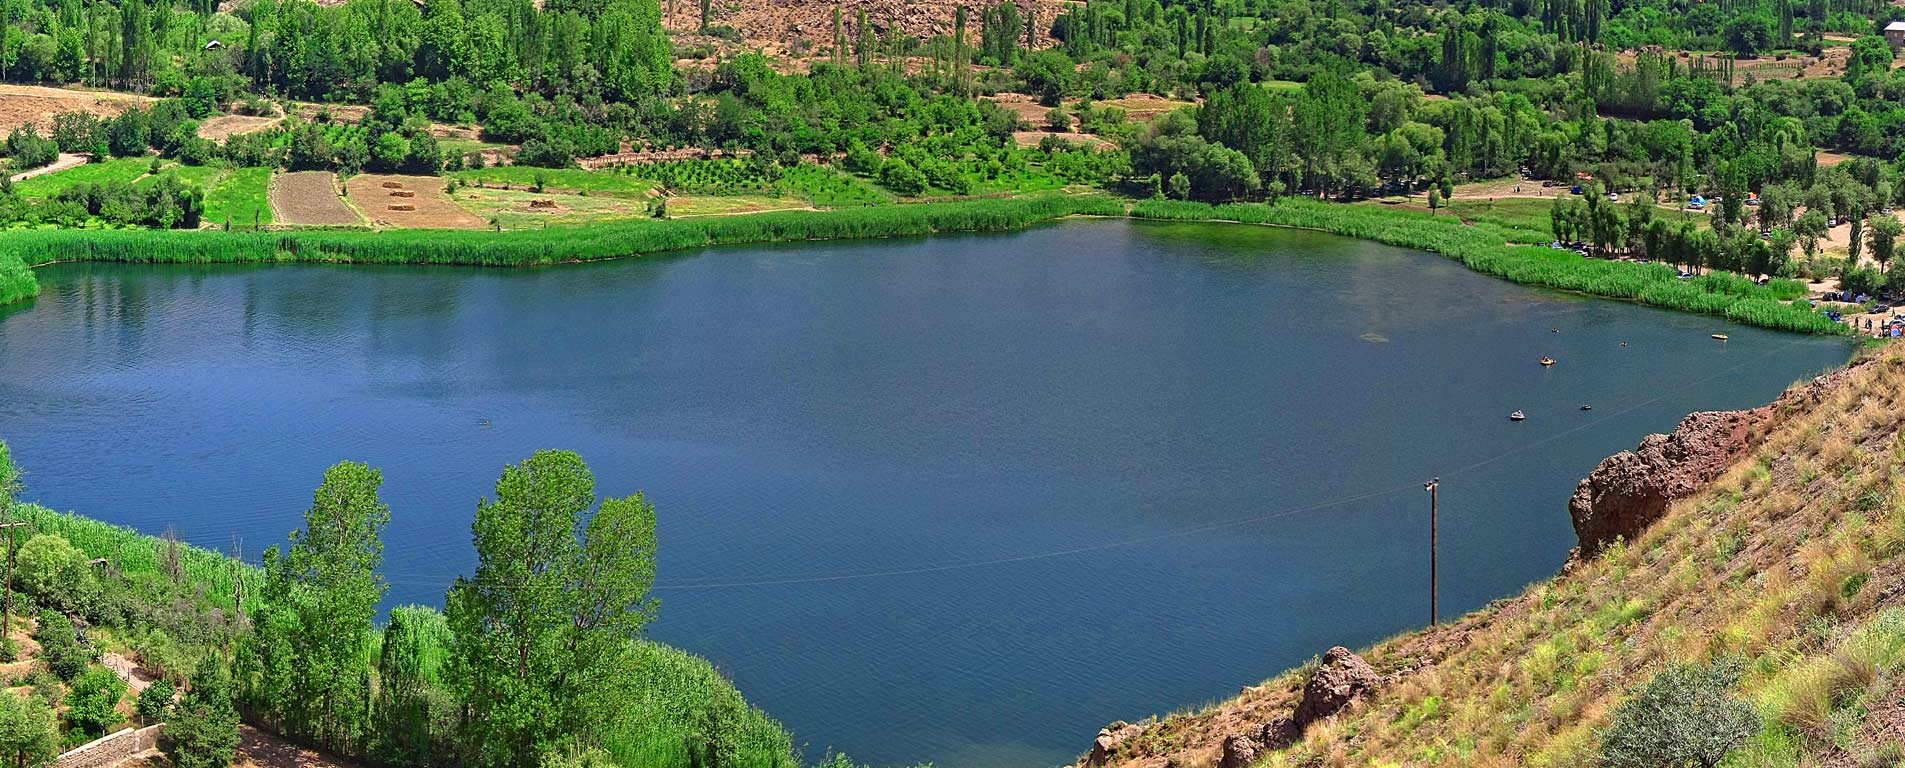 دریاچه اوان ، طبیعتی رویایی در دل الموت